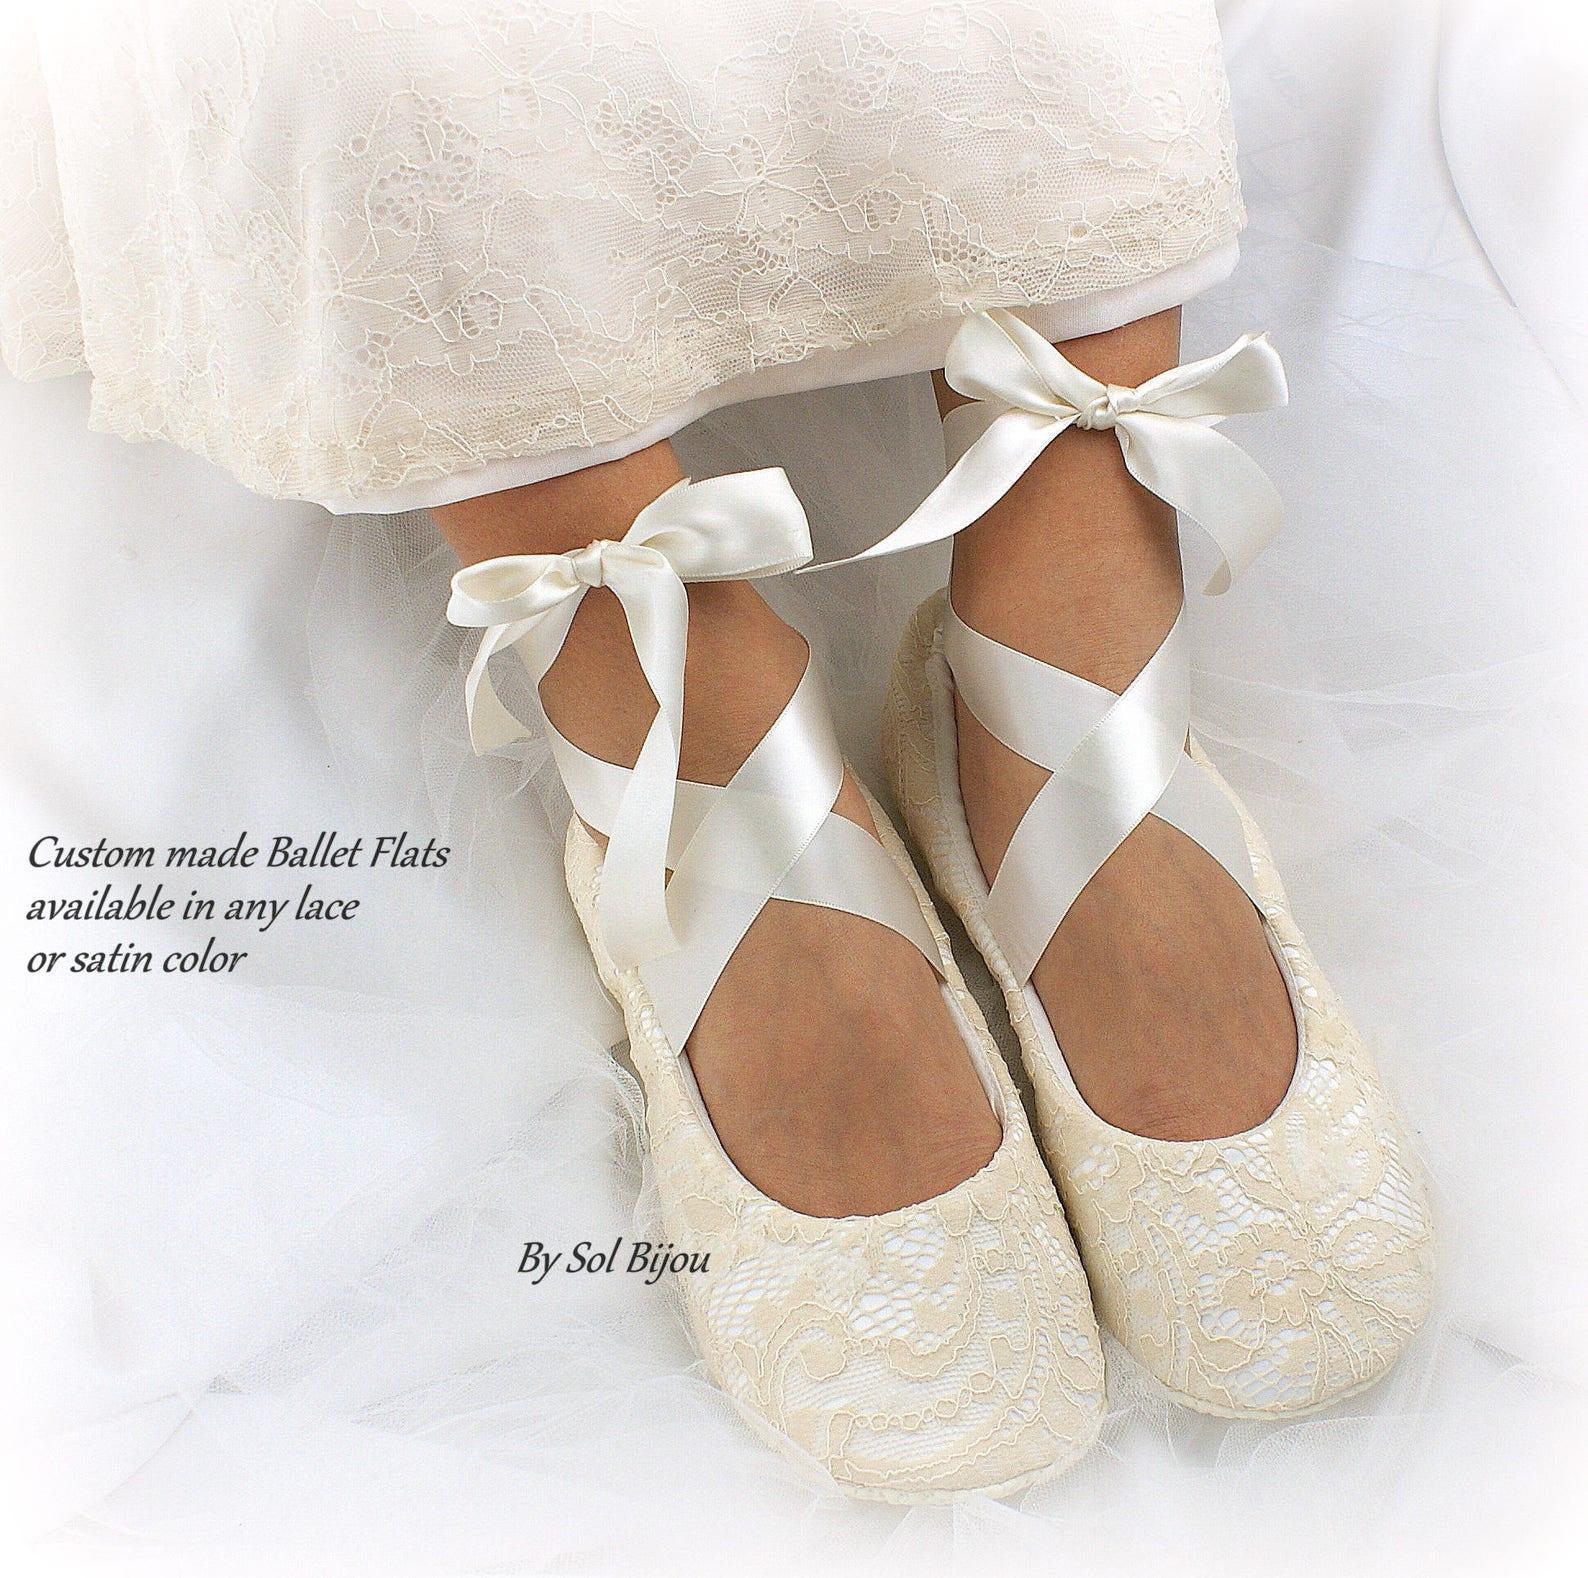 yellow and gray bridal flats, wedding ballet flats in satin with ribbon ties, custom wedding flats